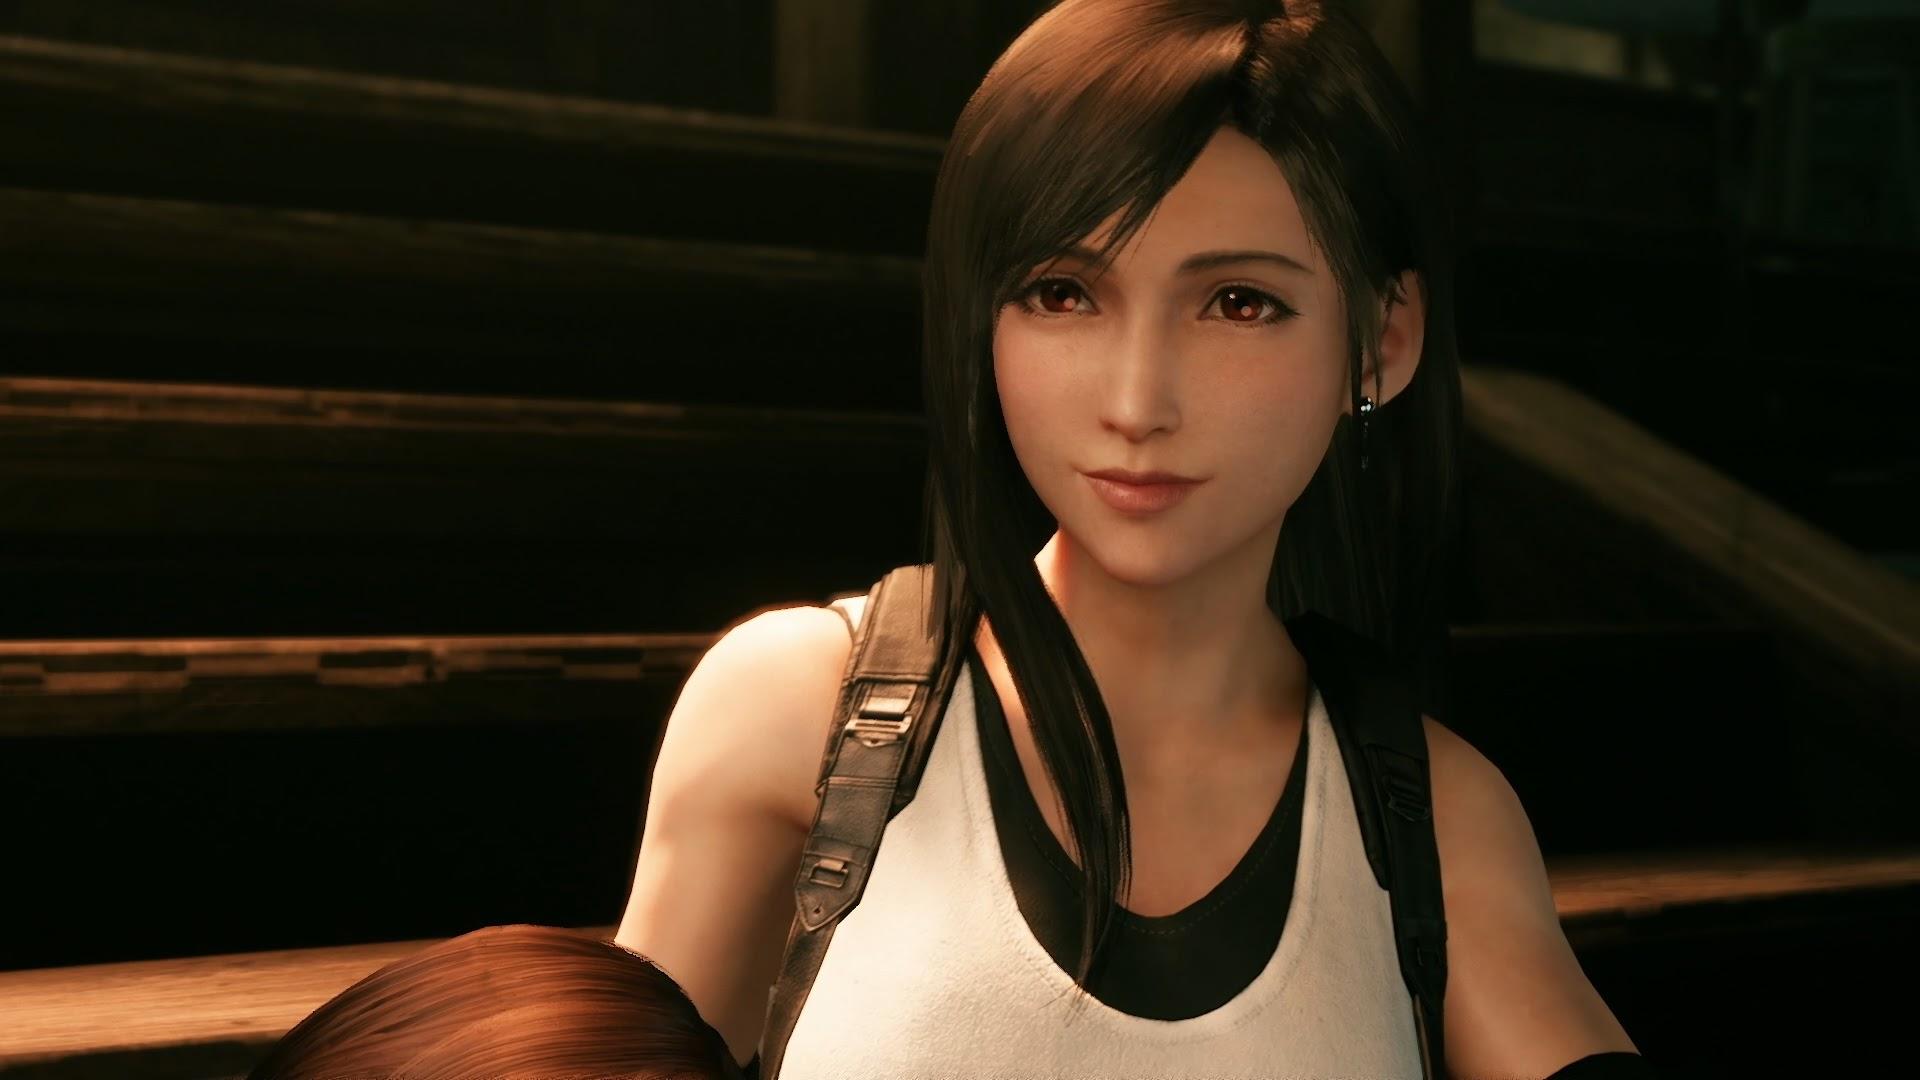 Tifa Lockhart Final Fantasy Artwork Hd Fantasy Girls 4k: Tifa Lockhart, Final Fantasy 7 Remake, 4K, #19 Wallpaper